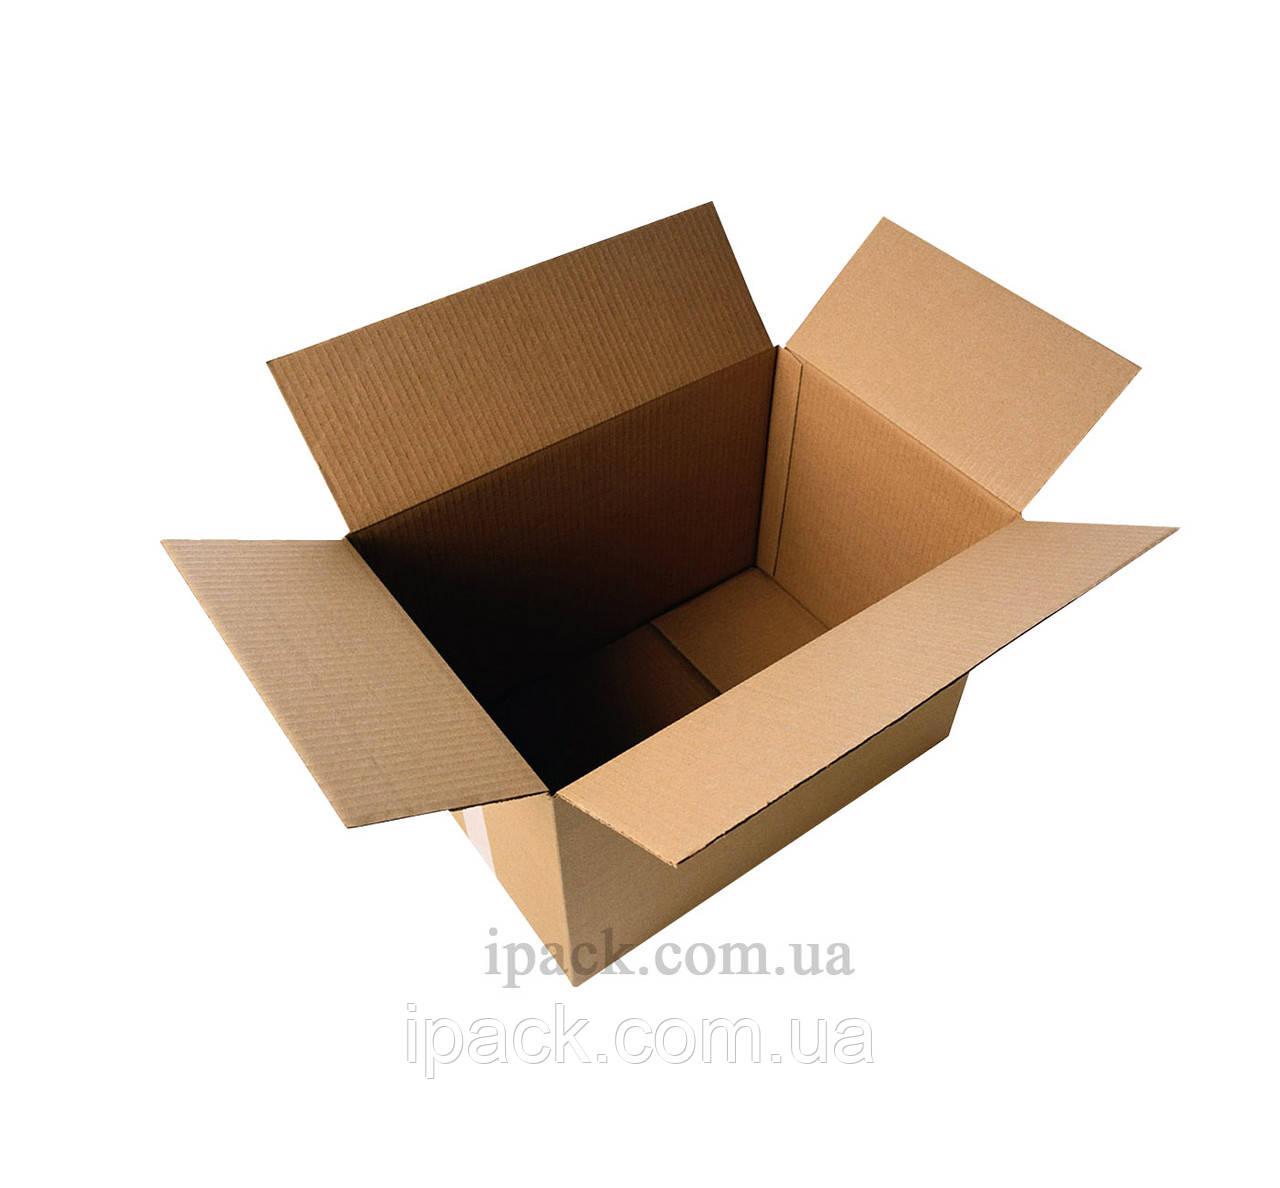 Гофроящик 390*210*220 мм, бурый, четырехклапанный картонный короб